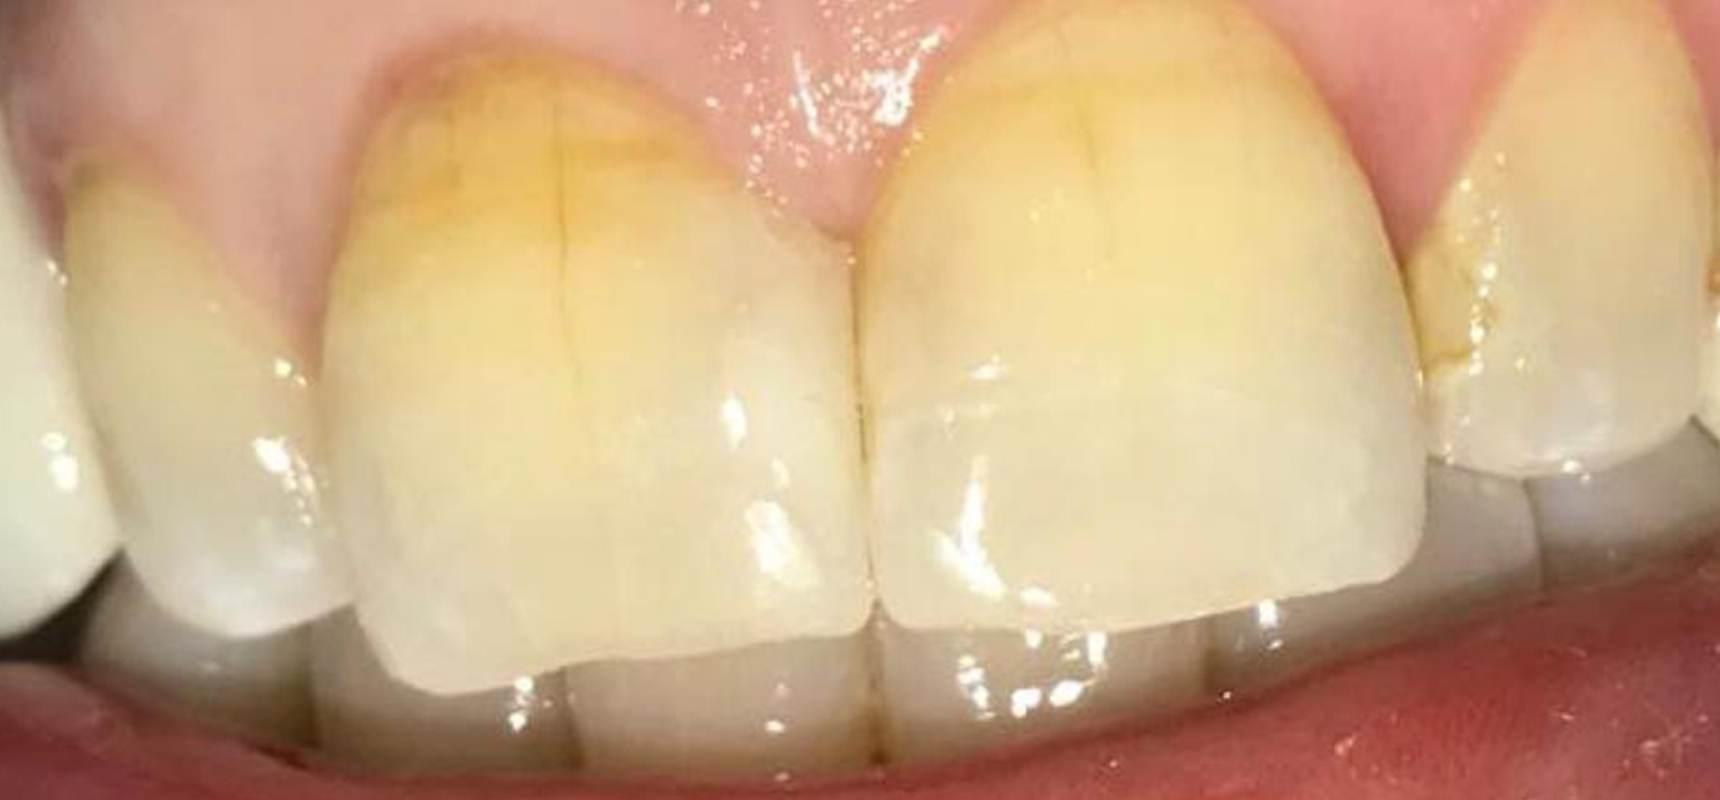 After-Composite filling to close midline diastema